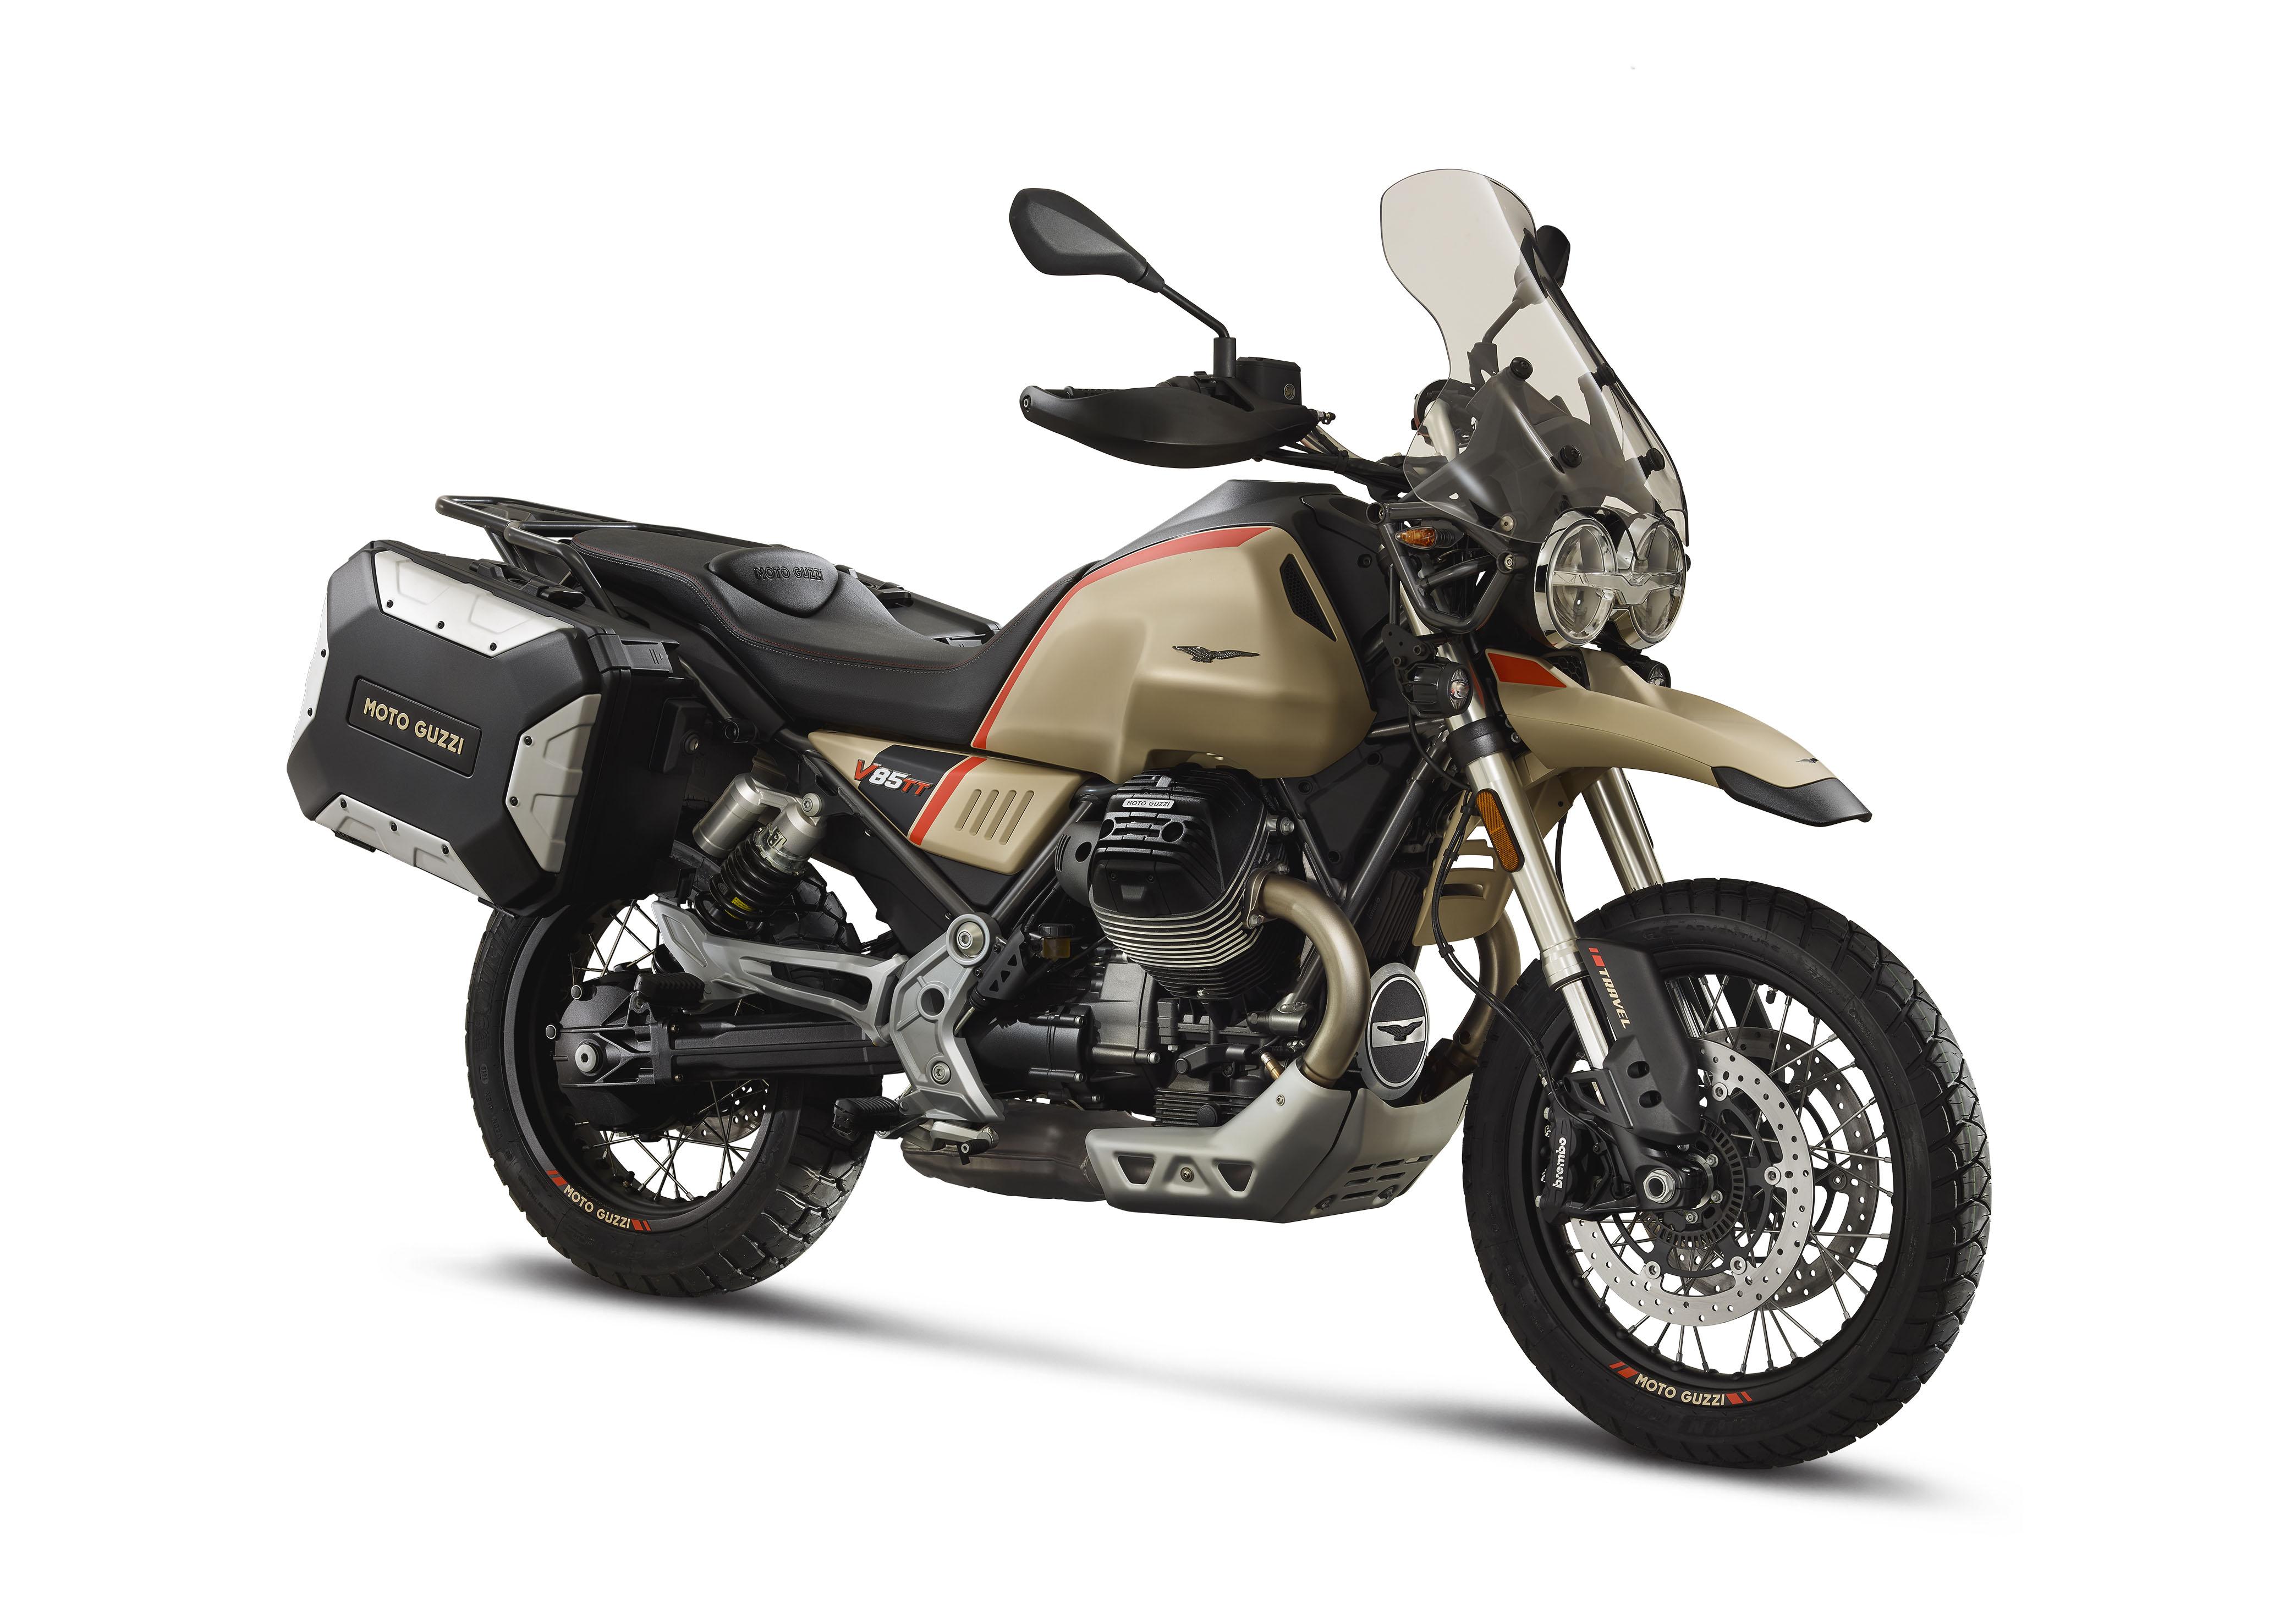 Precios de Moto Guzzi V85 TT Travel